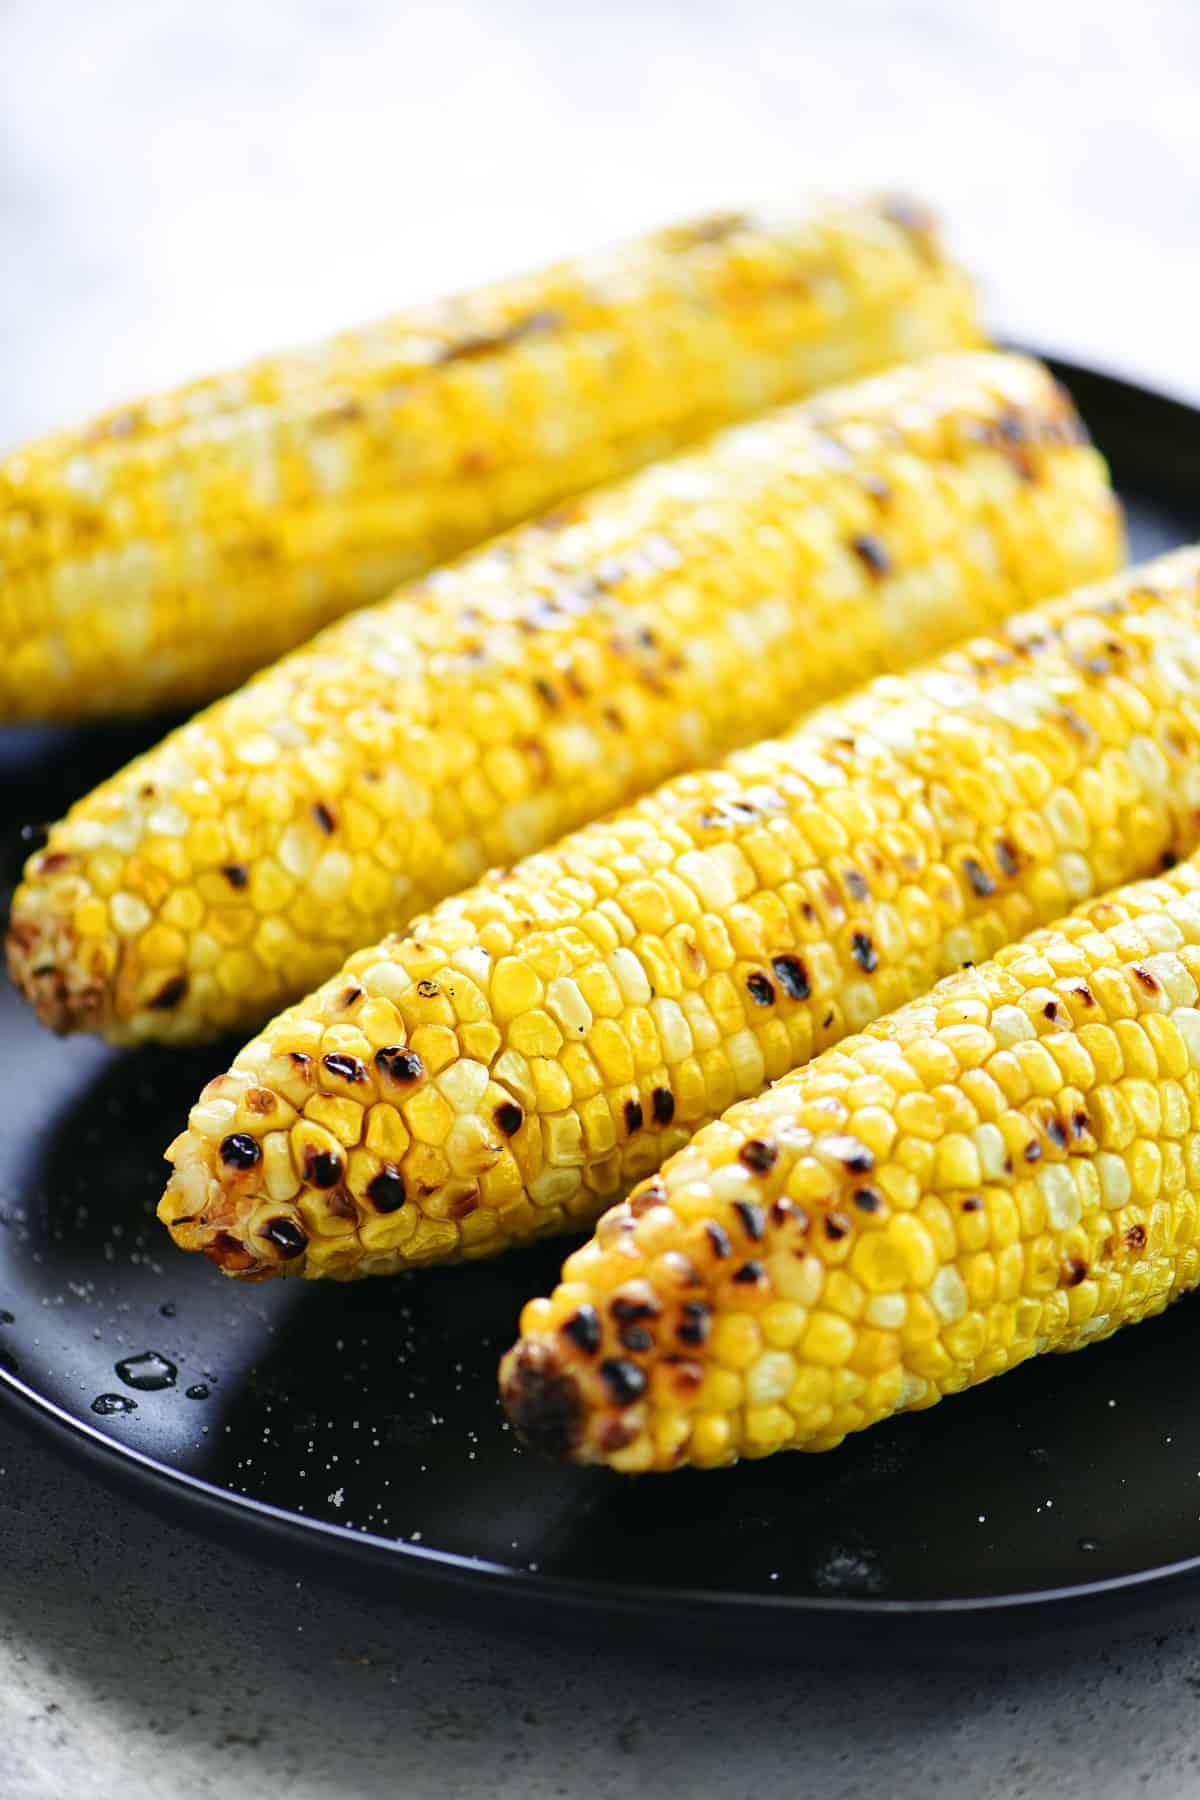 Copy of Grilled Corn On The Cob Peeled • Kim Schob